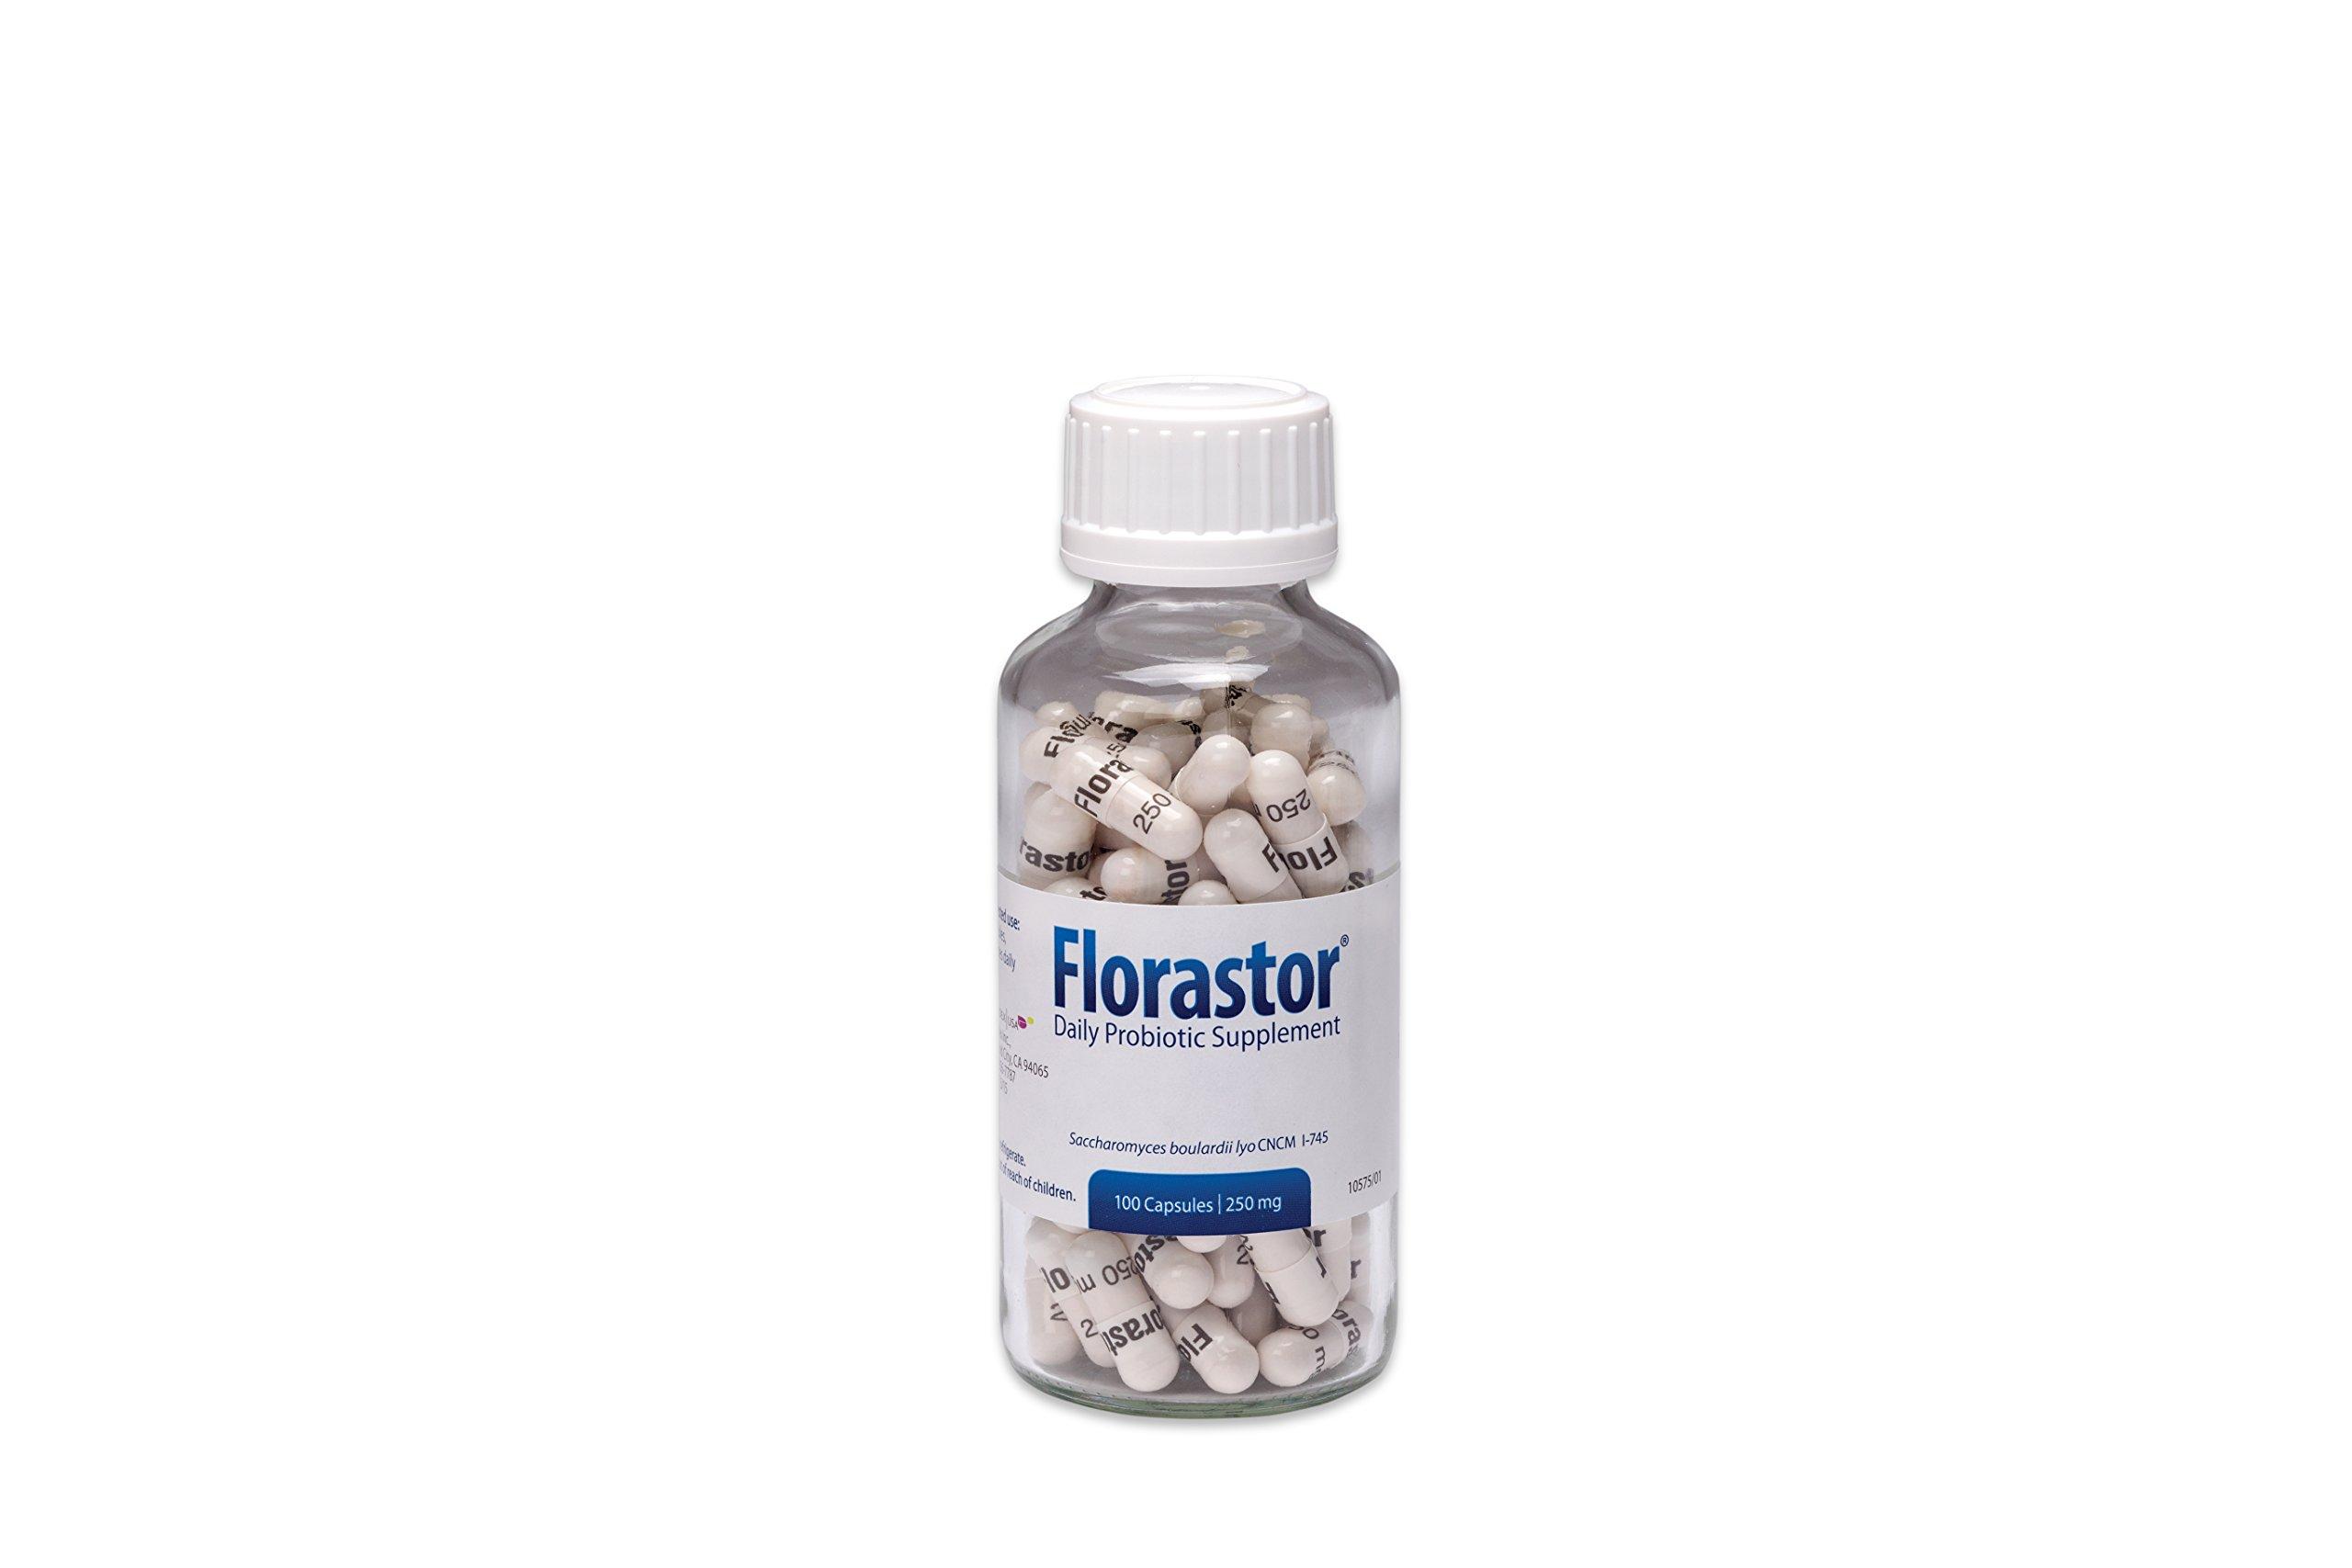 Florastor Daily Probiotic Supplement for Men and Women – Saccharomyces Boulardii lyo CNCM I-745 (250 mg; 100 Capsules) by Florastor (Image #3)